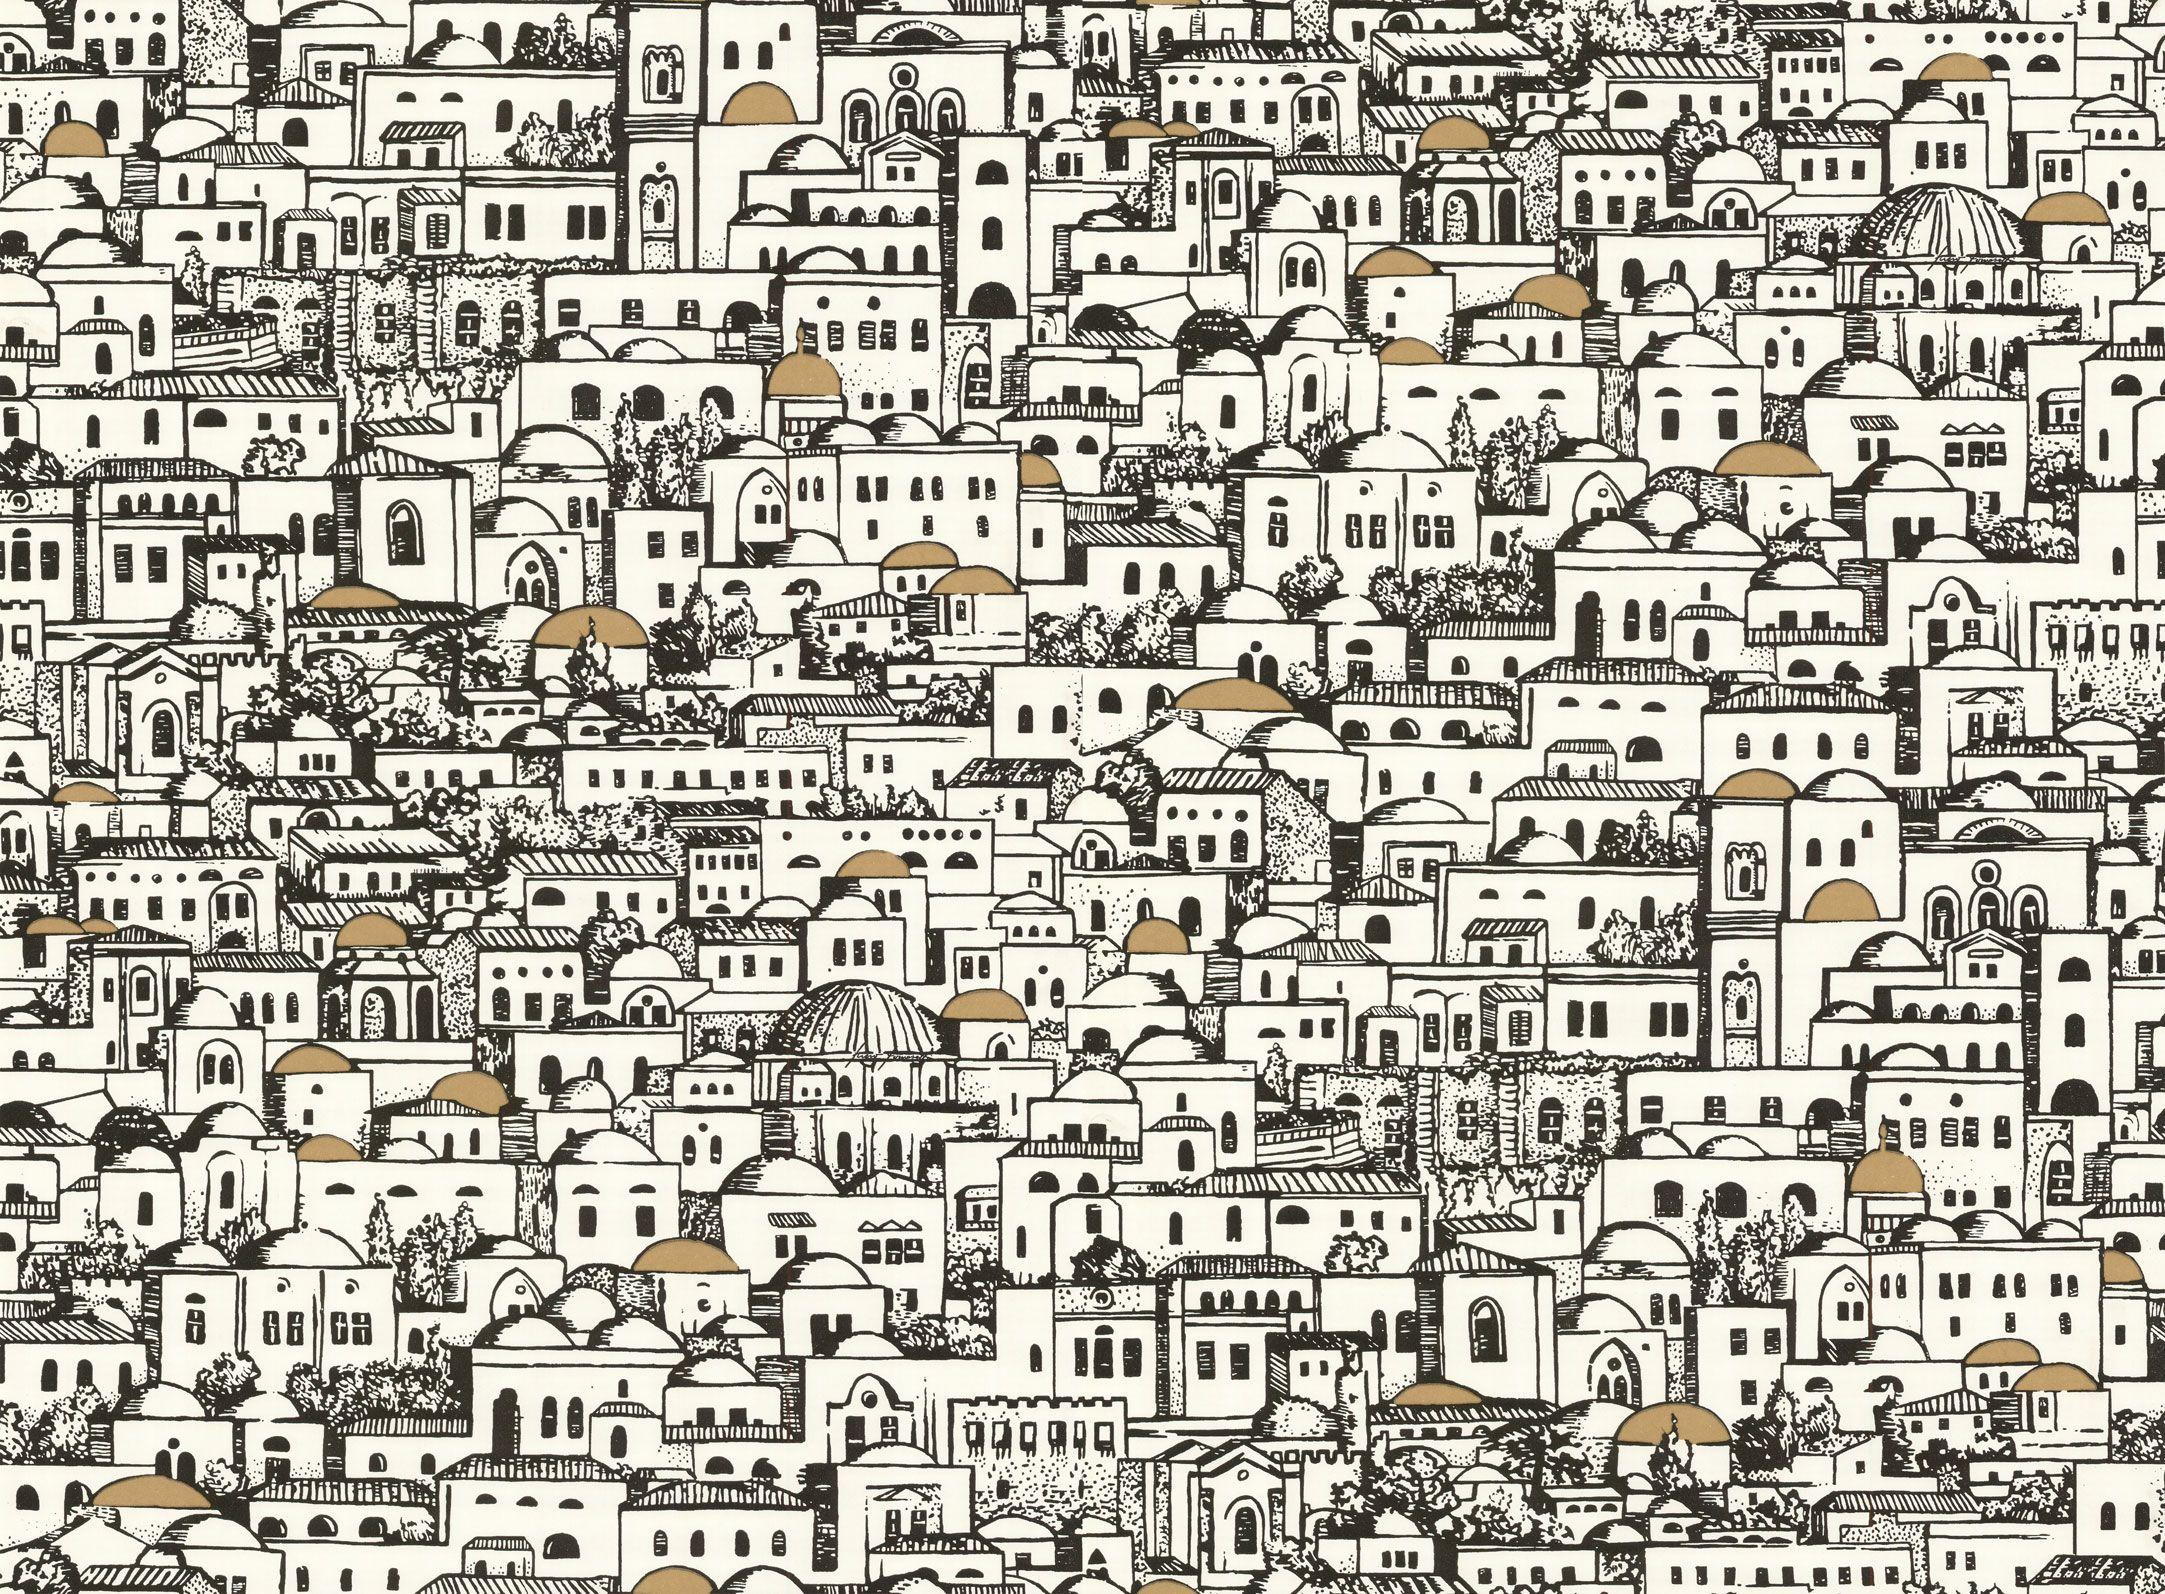 Httpwwwcoleandsoncomencollectionfornasetticollection - Piero fornasetti wallpaper designs